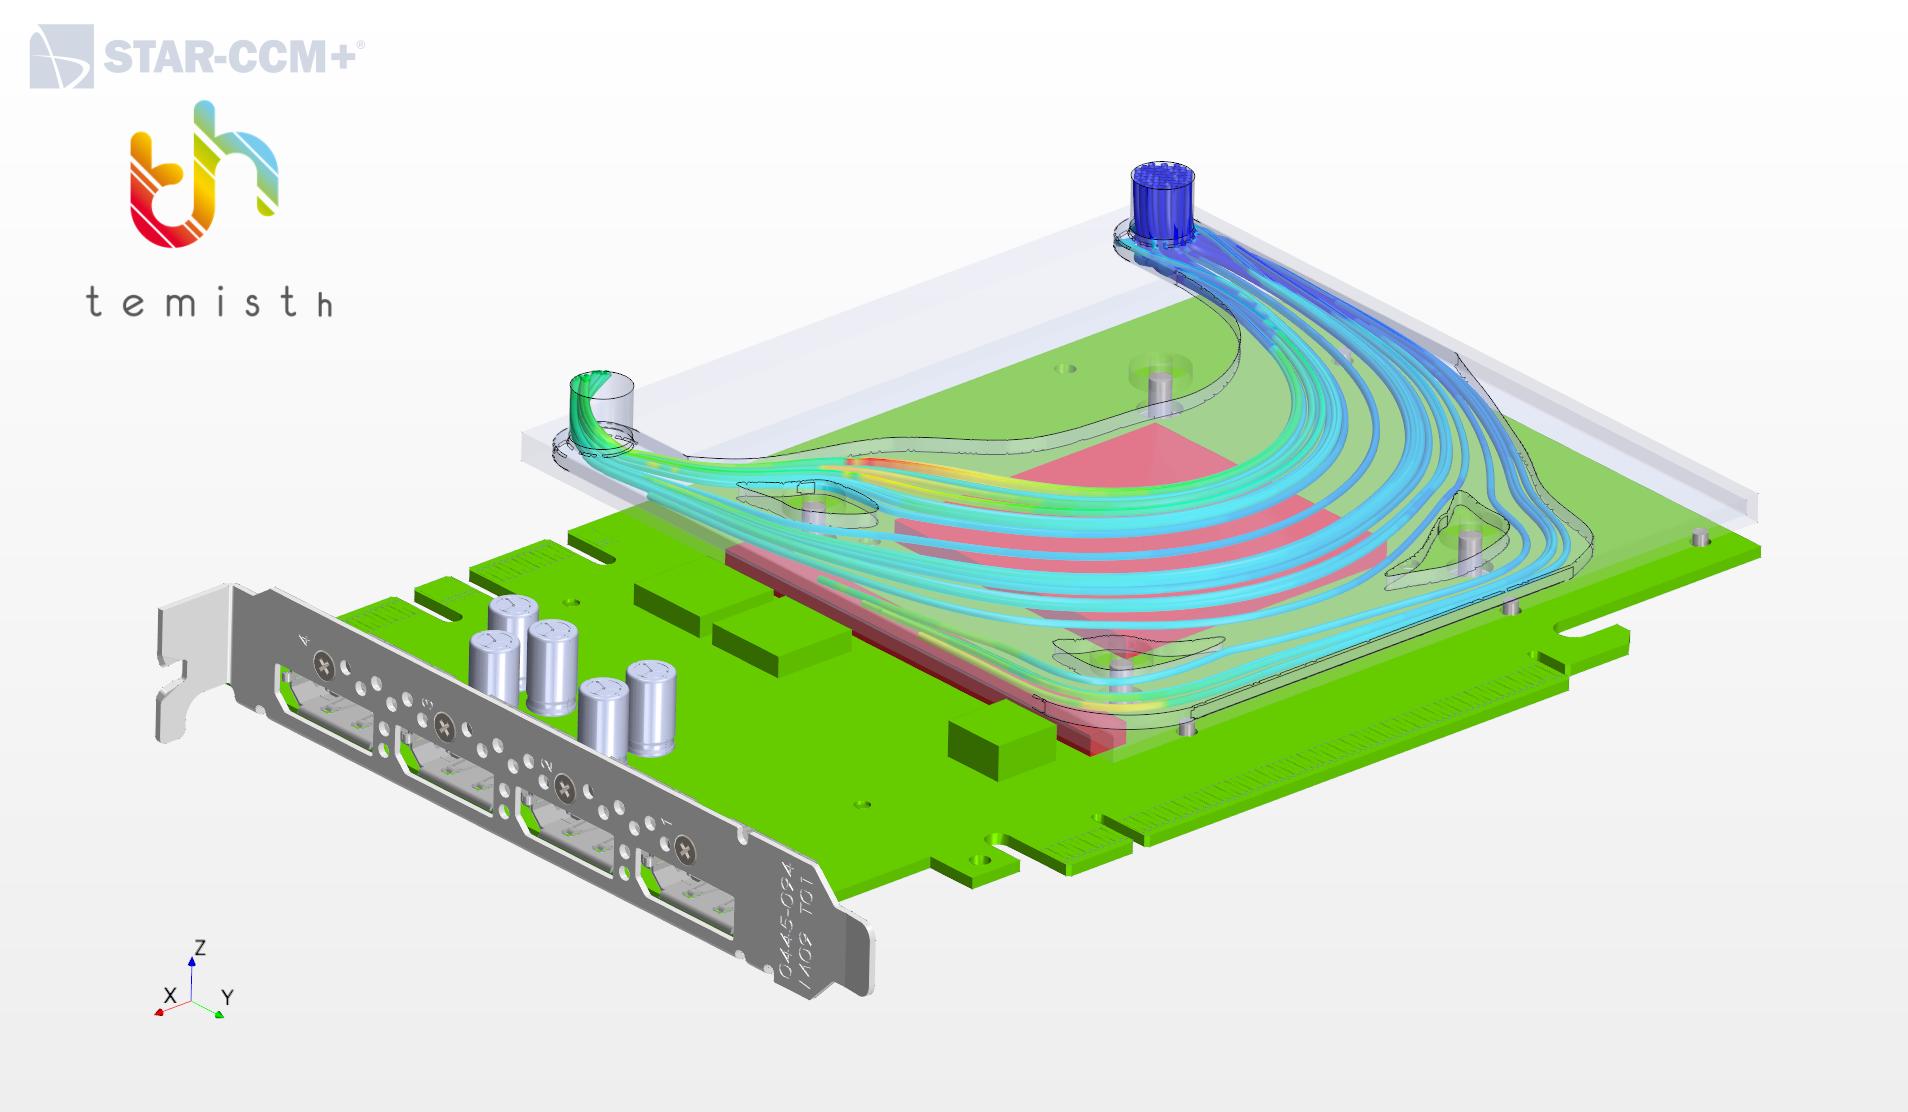 Modelization of GPU cooling - Optimization of a cold plate